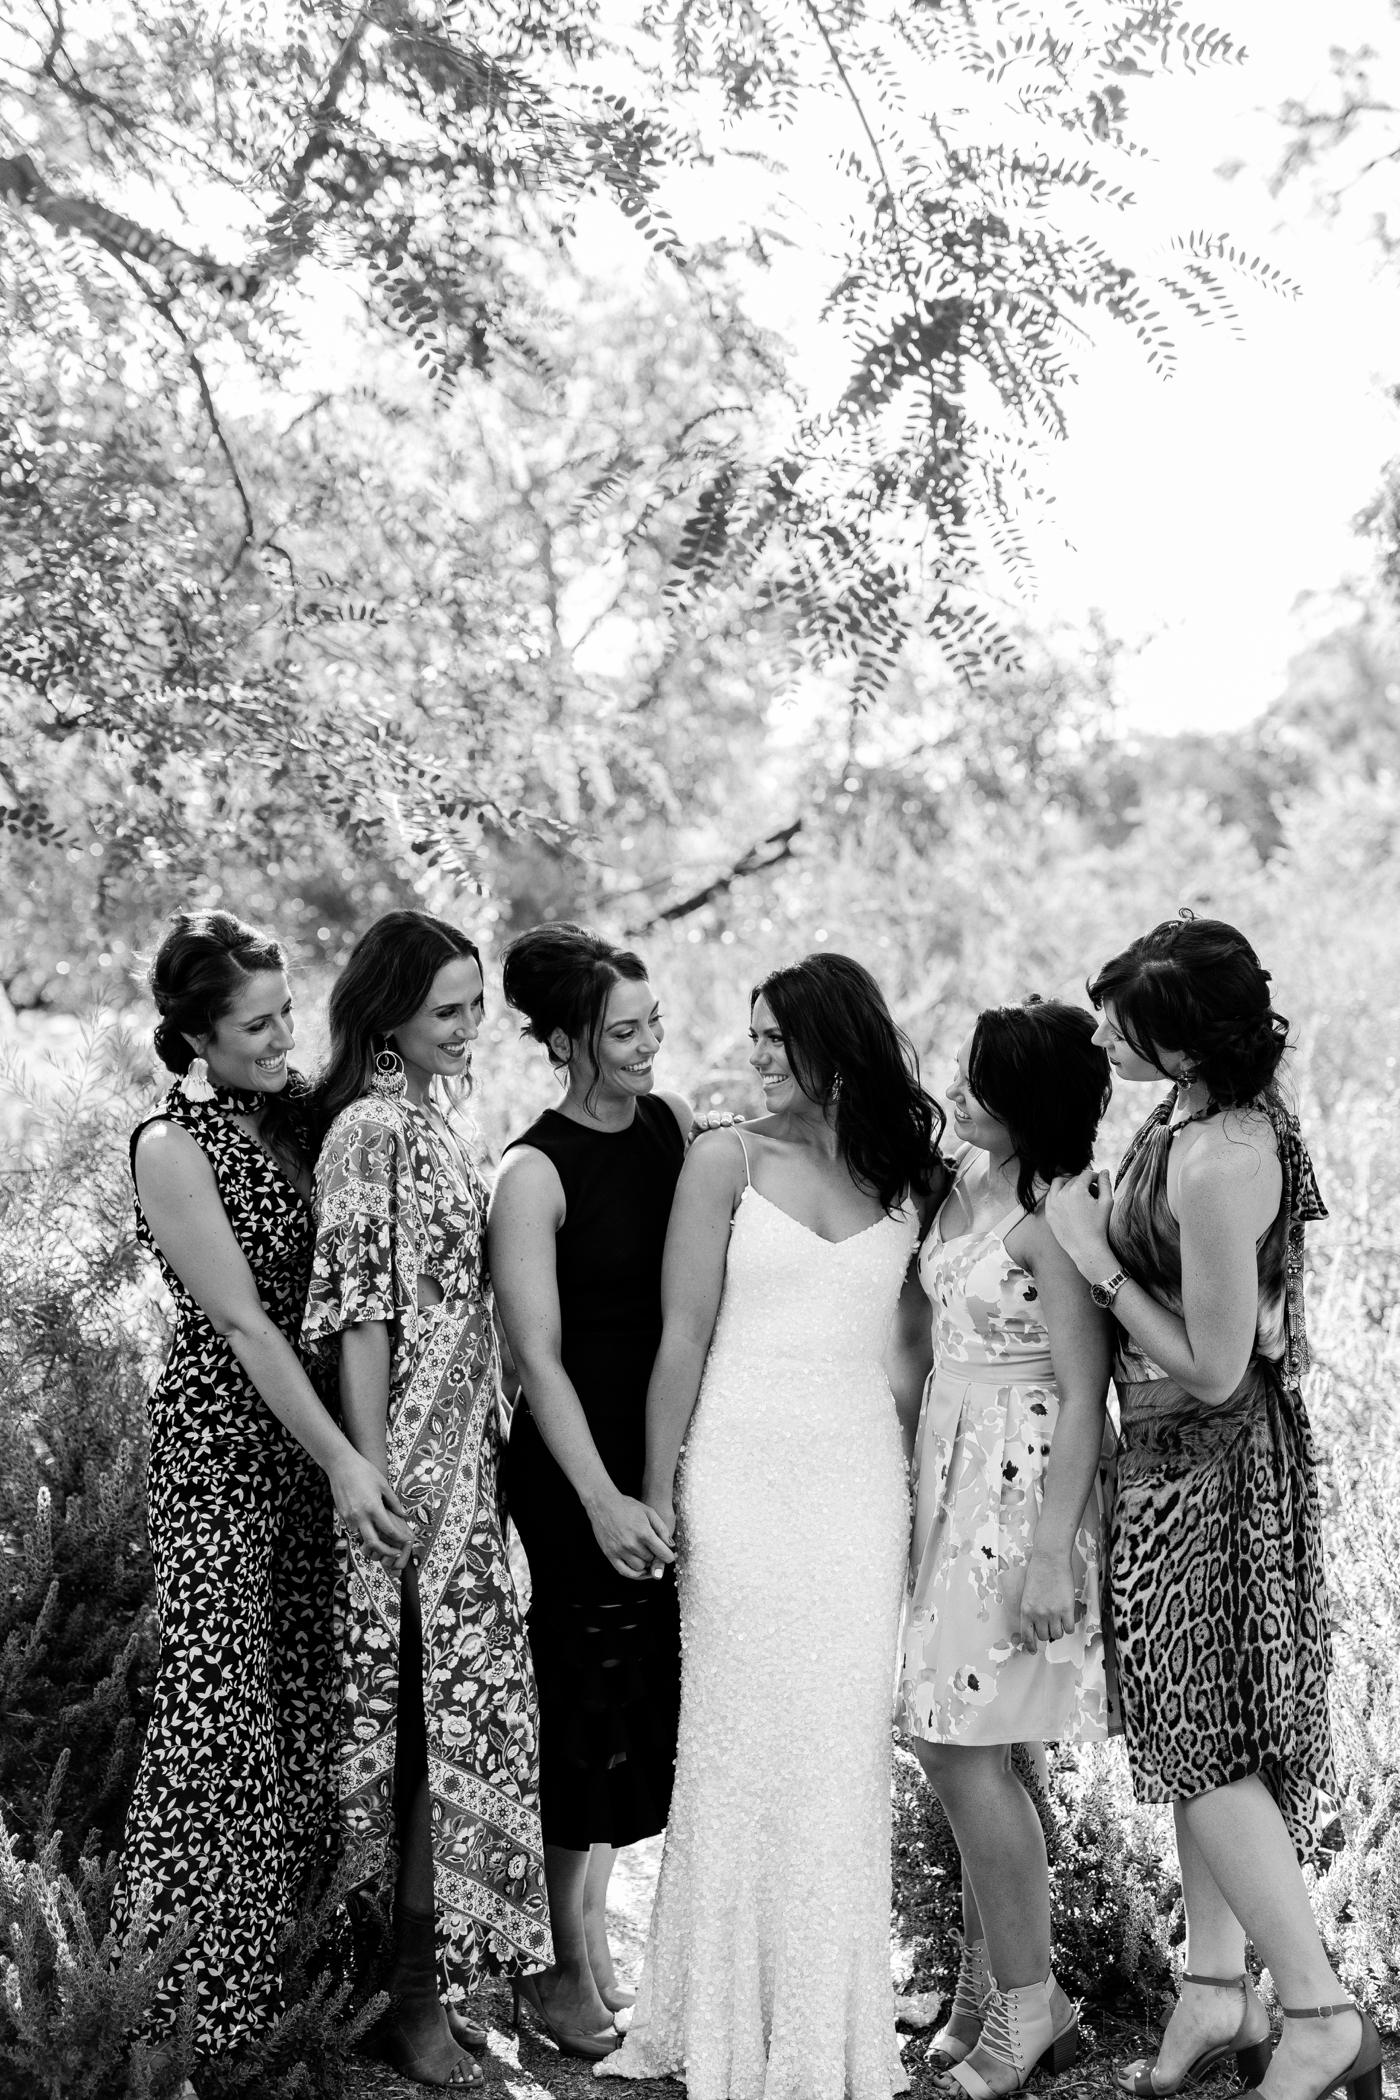 Kellie & Brent - Adelaide City Wedding - Natural wedding photography in Adelaide - Katherine Schultz - www.katherineschultzphotography.com 31